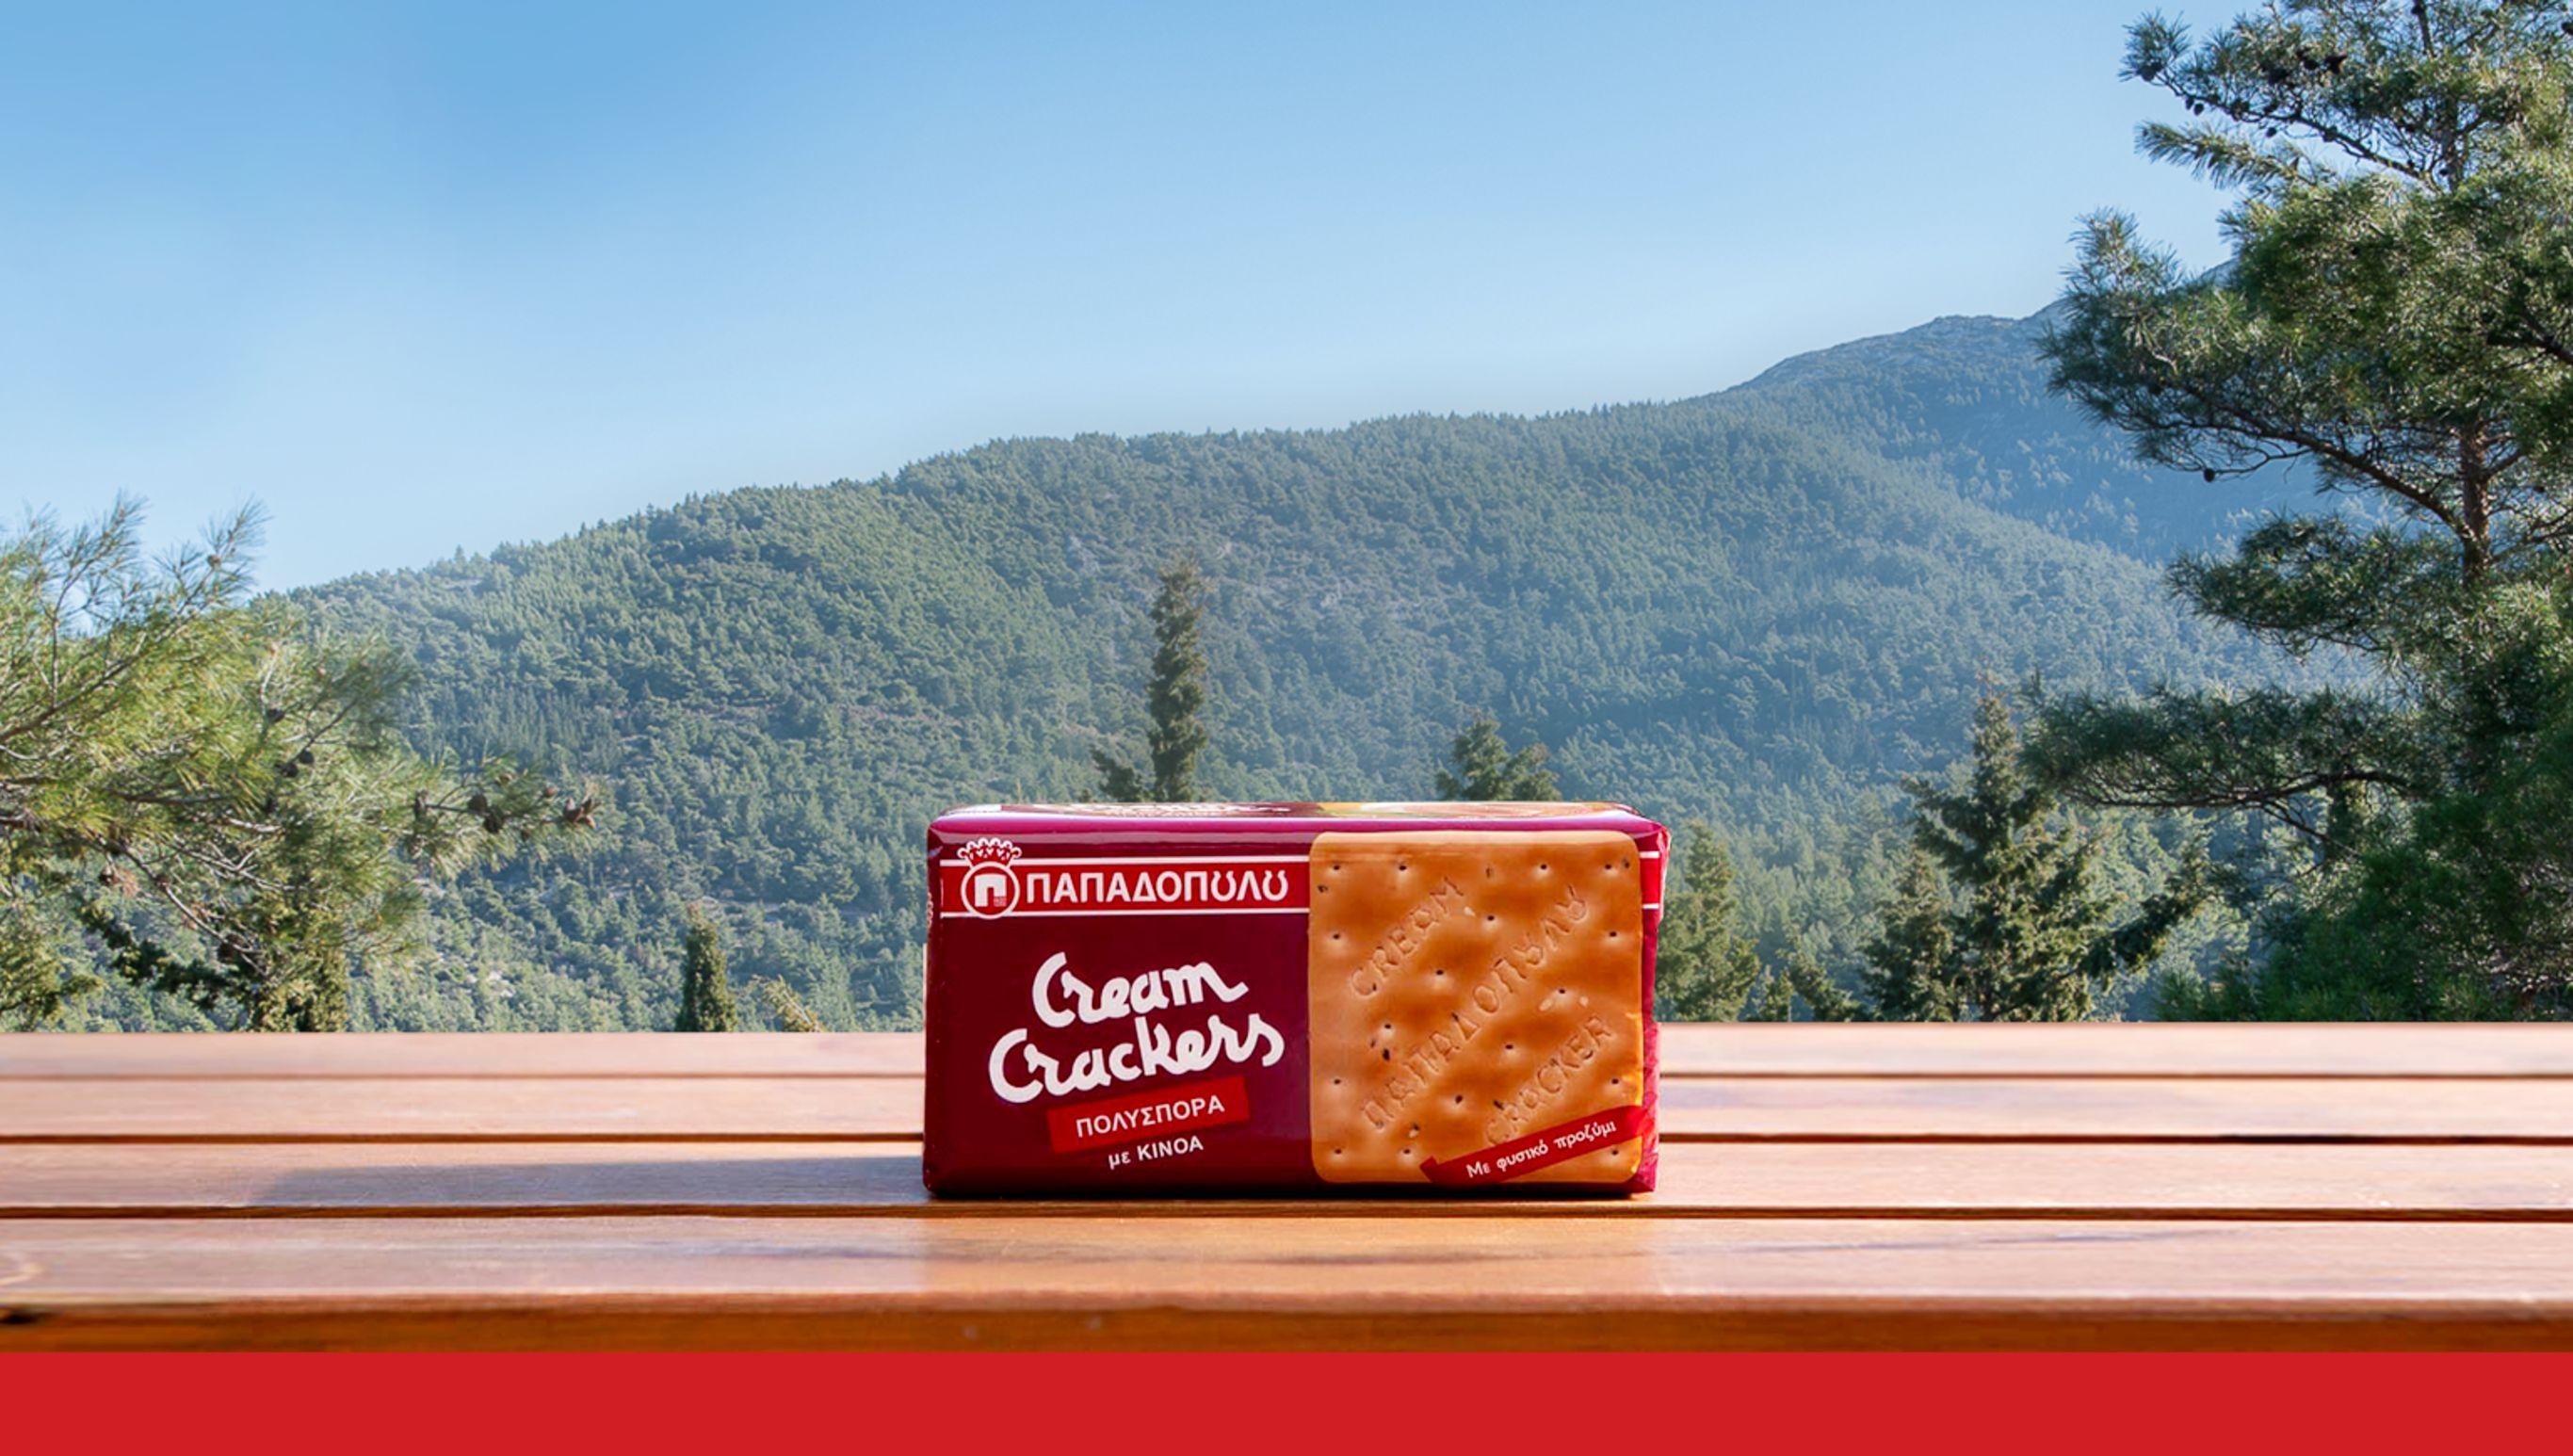 Featured image for Νέα γεύση Cream Crackers Πολύσπορα από την Ε.Ι. Παπαδόπουλος Α.Ε.